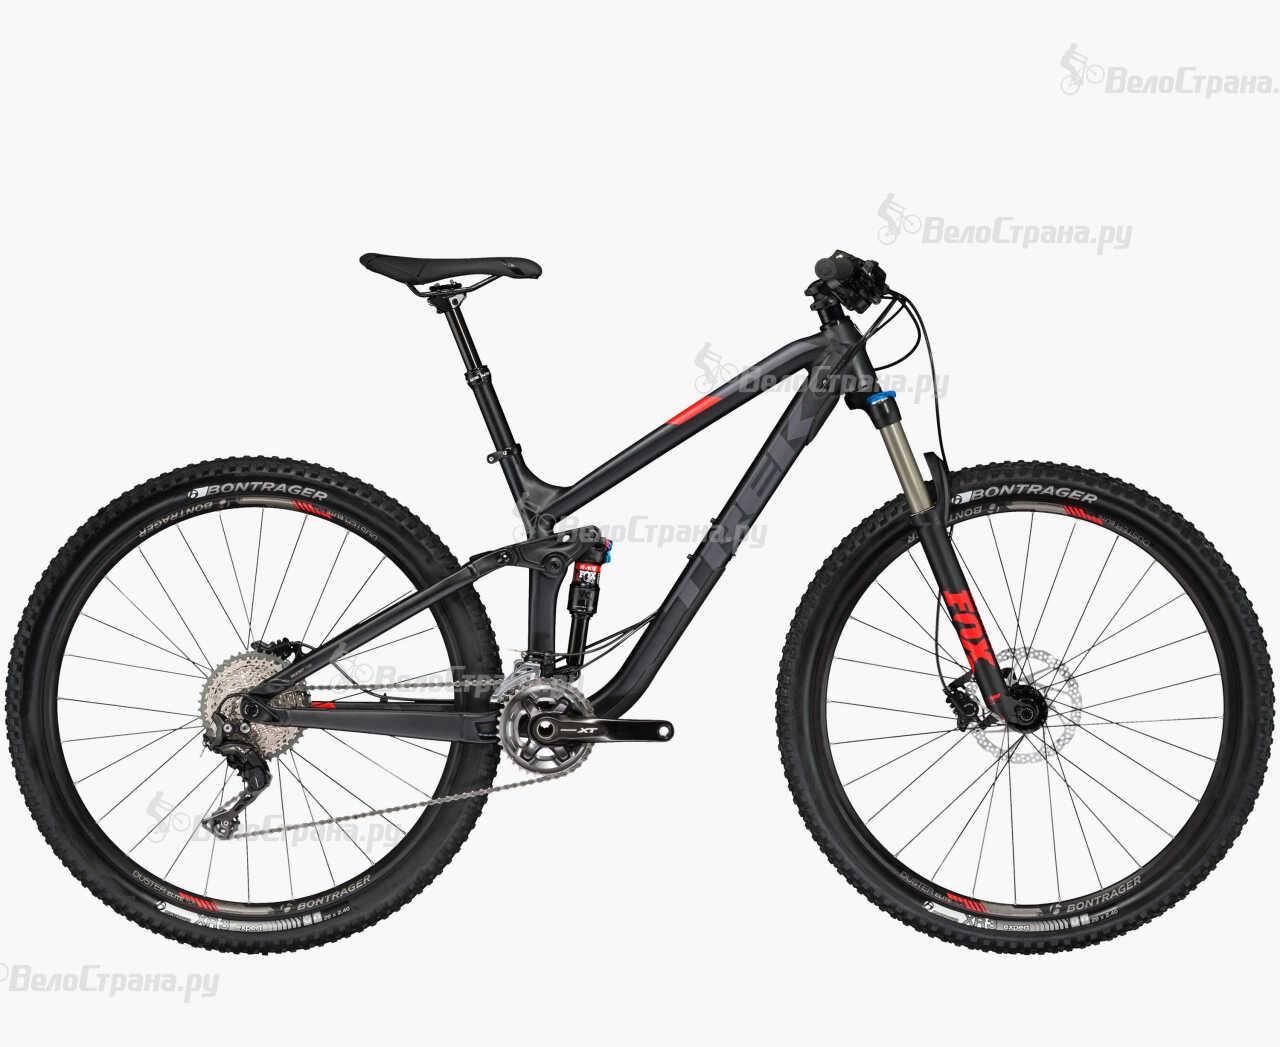 Велосипед Trek Fuel EX 8 29 (2017) trek fuel ex 9 27 5